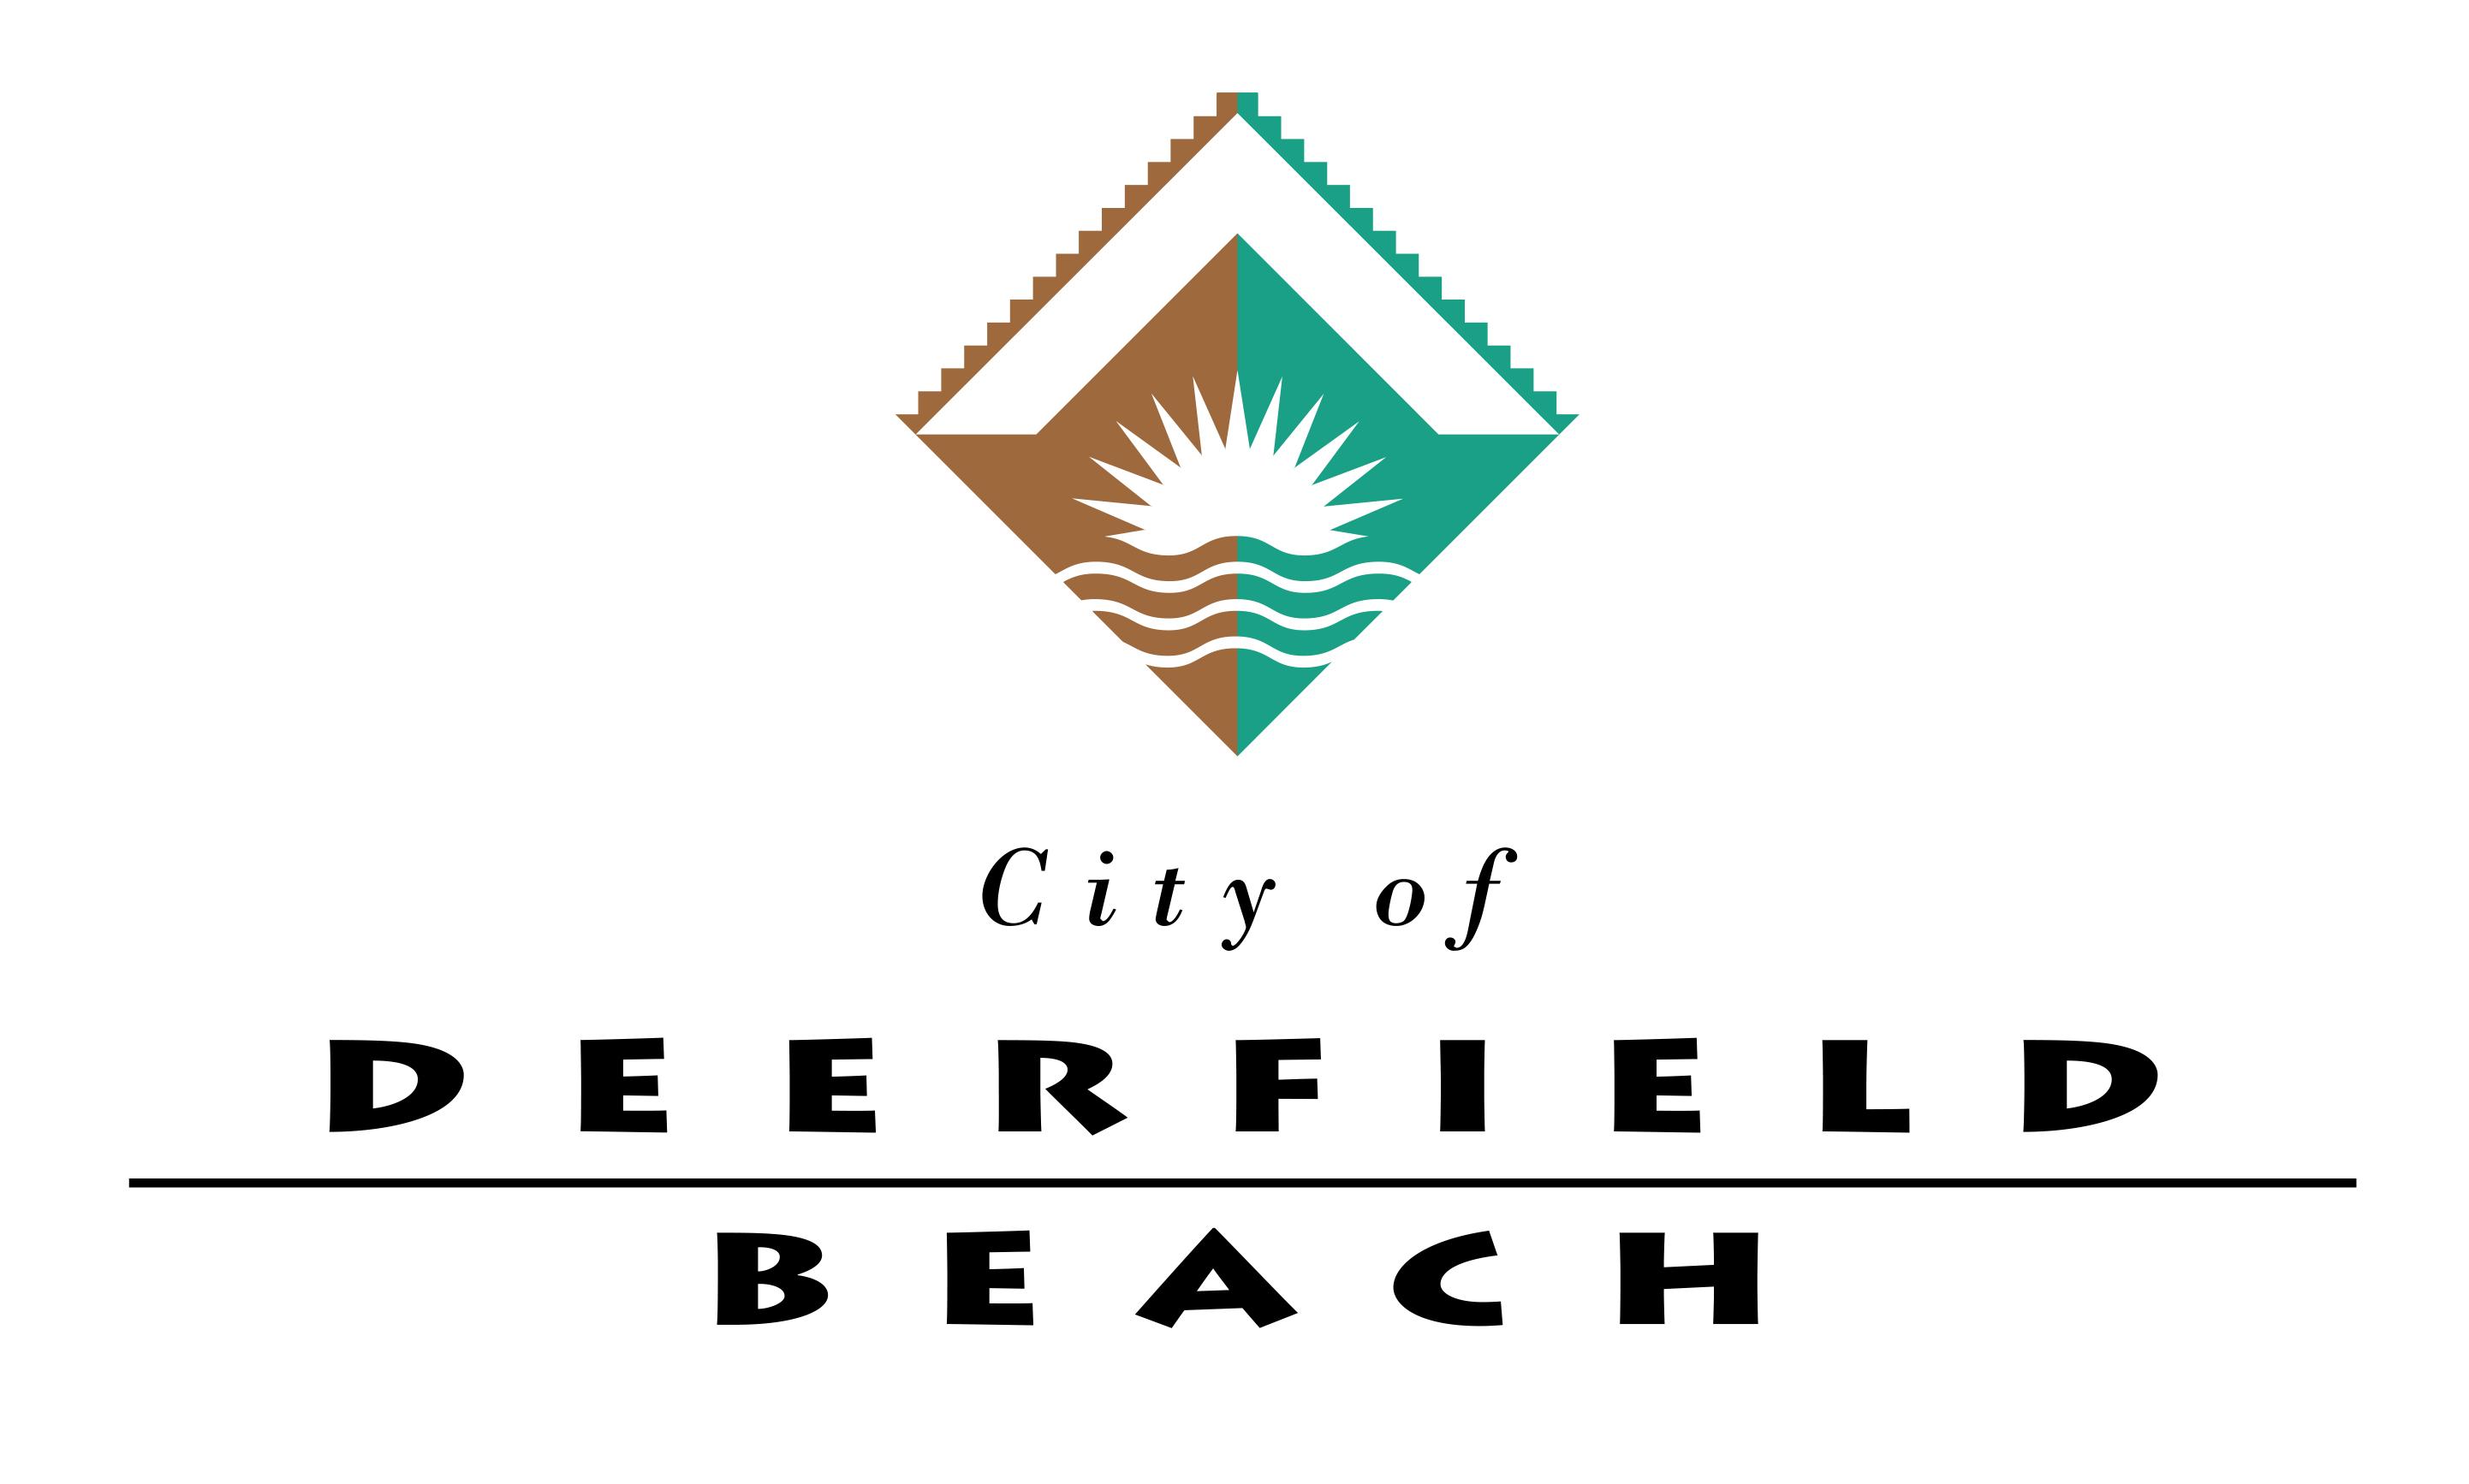 Don King Productions Inc Deerfield Beach Florida